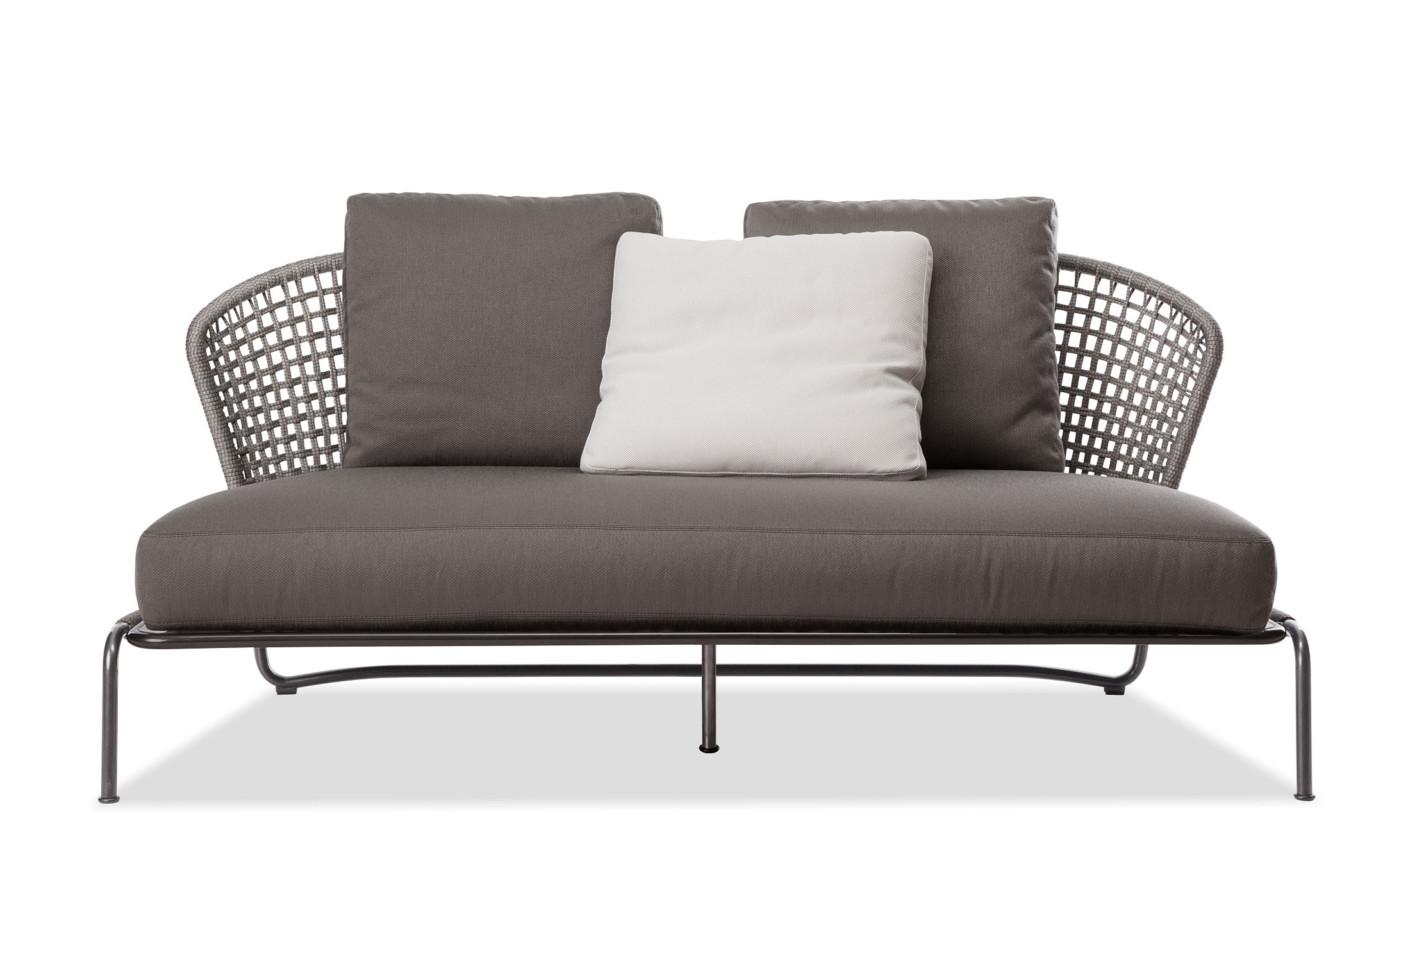 sofa camping charleston nick scali aston cord outdoor von minotti stylepark